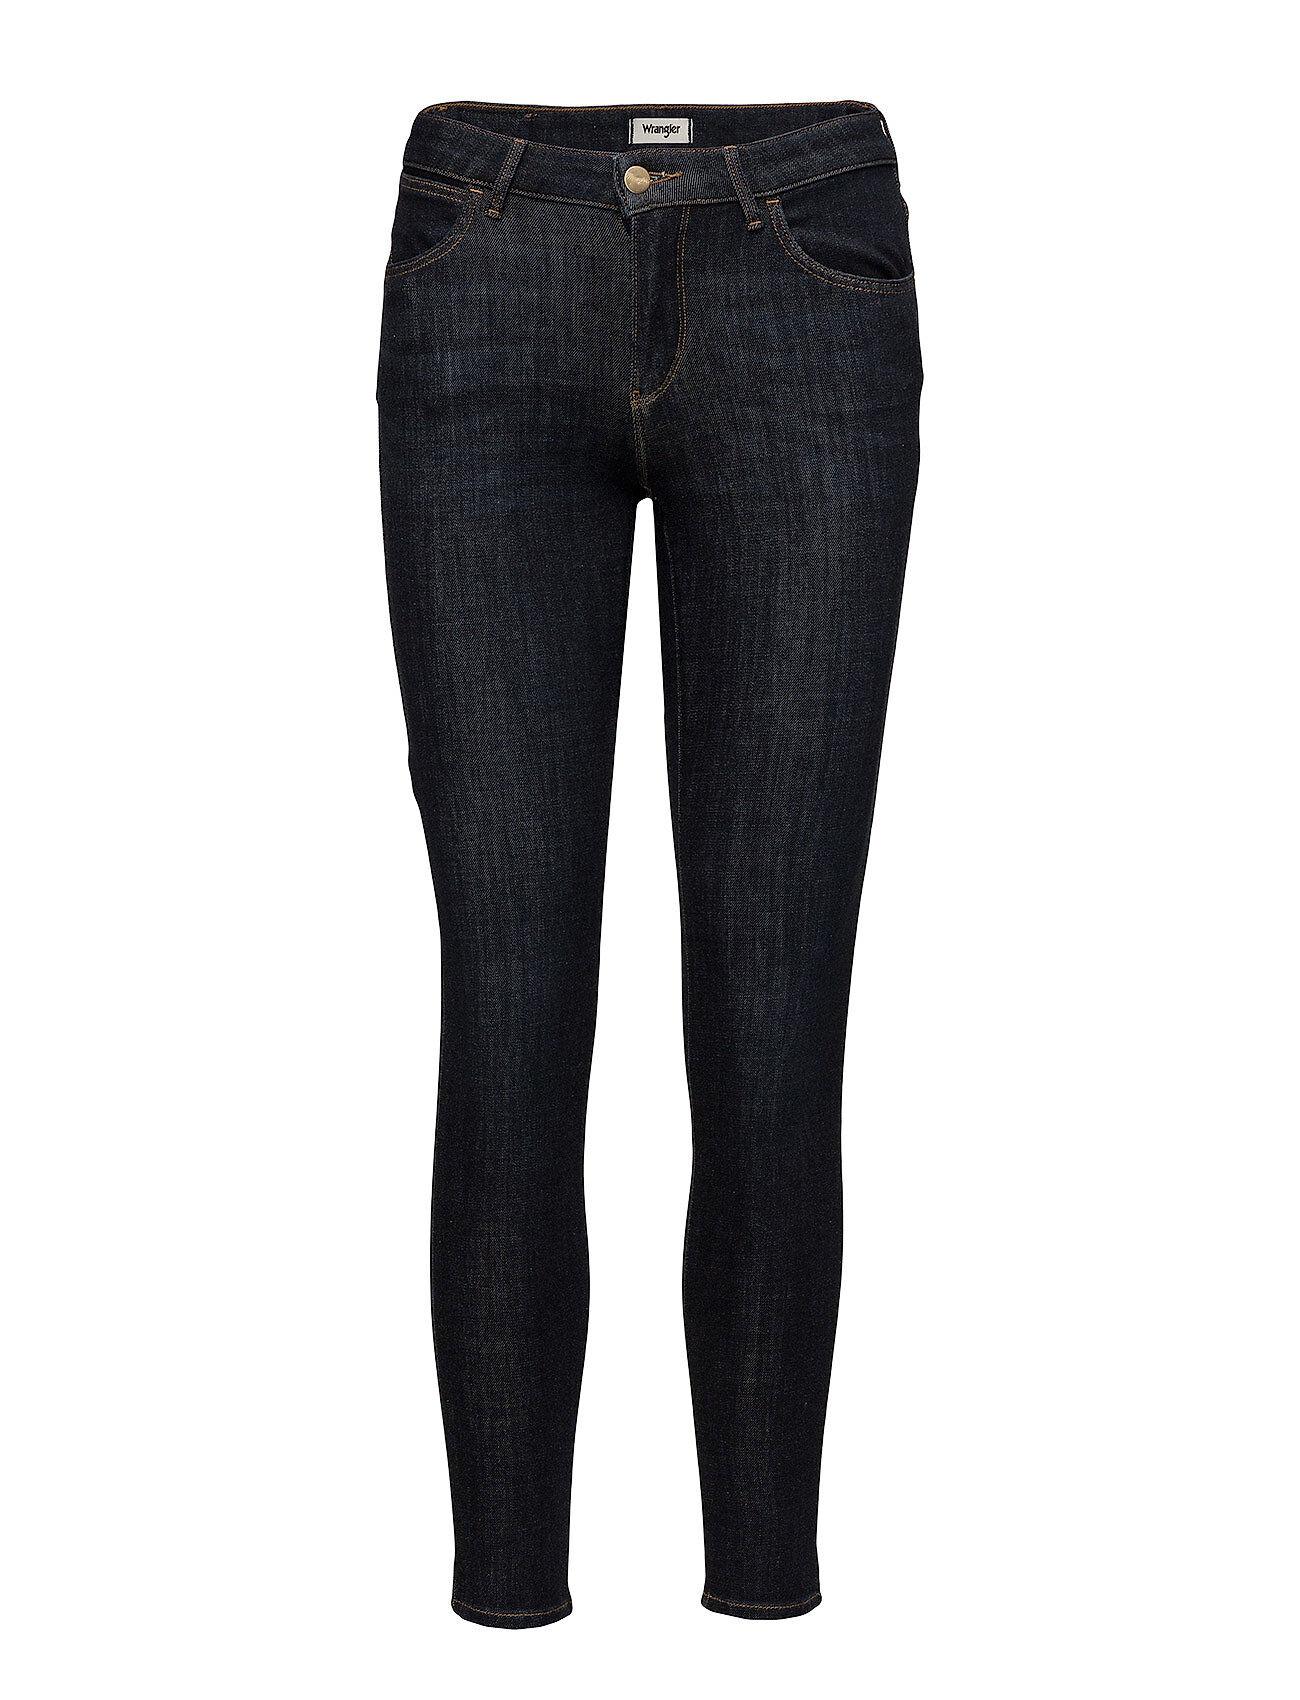 Wrangler Super Skinny Jeans